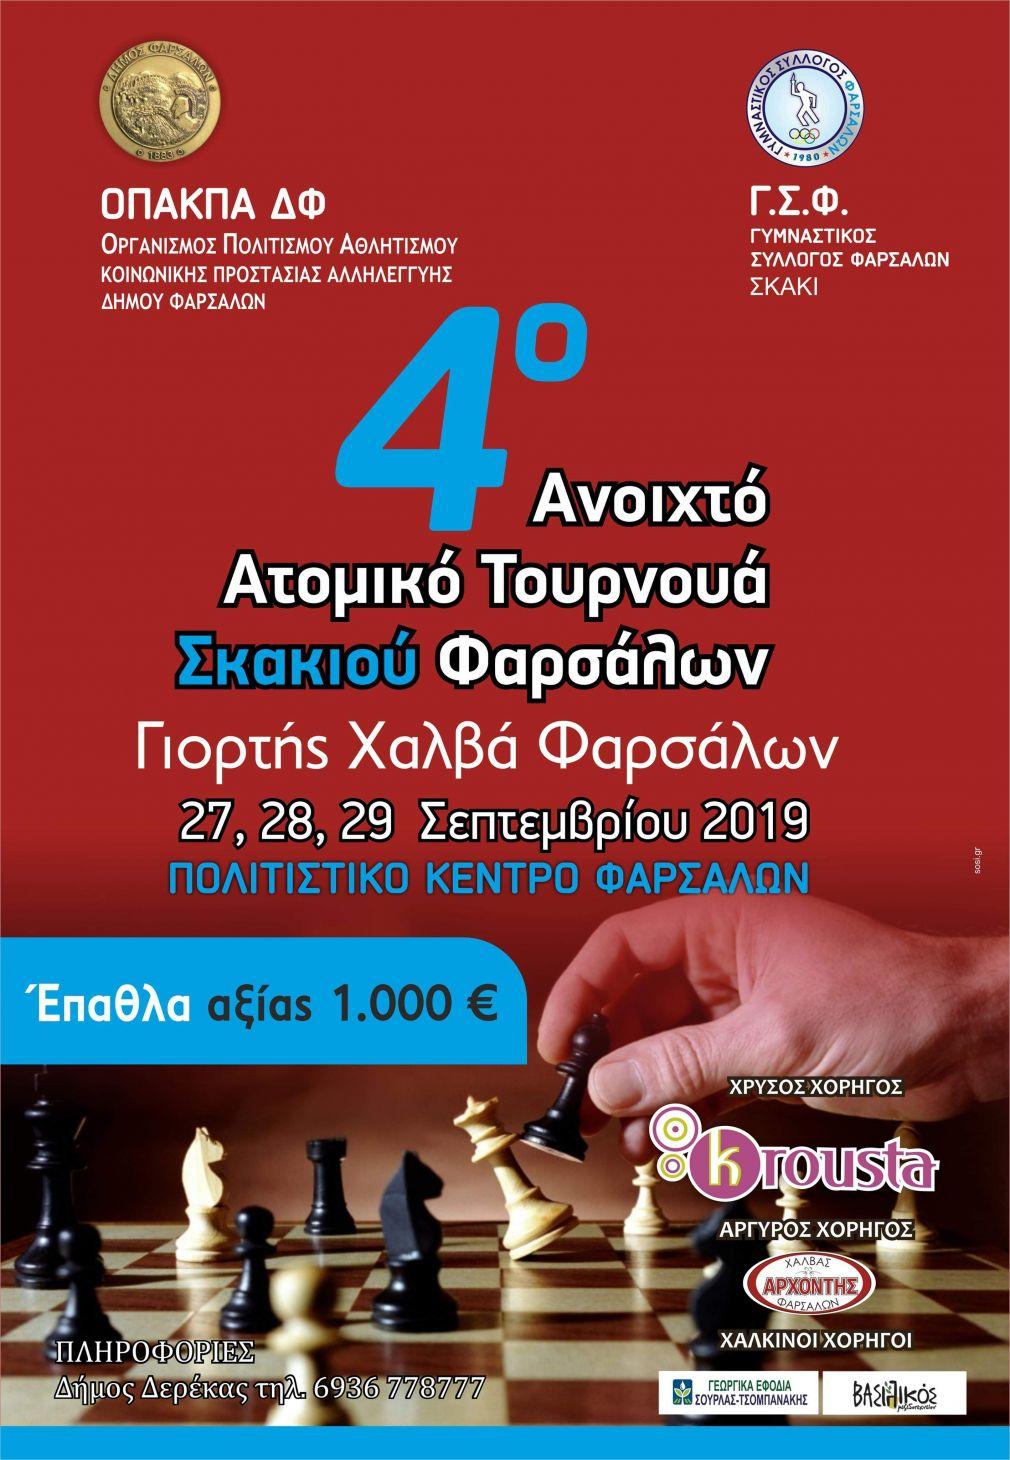 Photo of Σκακιστικός τουρισμός στα Φάρσαλα με το 4ο Τουρνουά Σκακιού